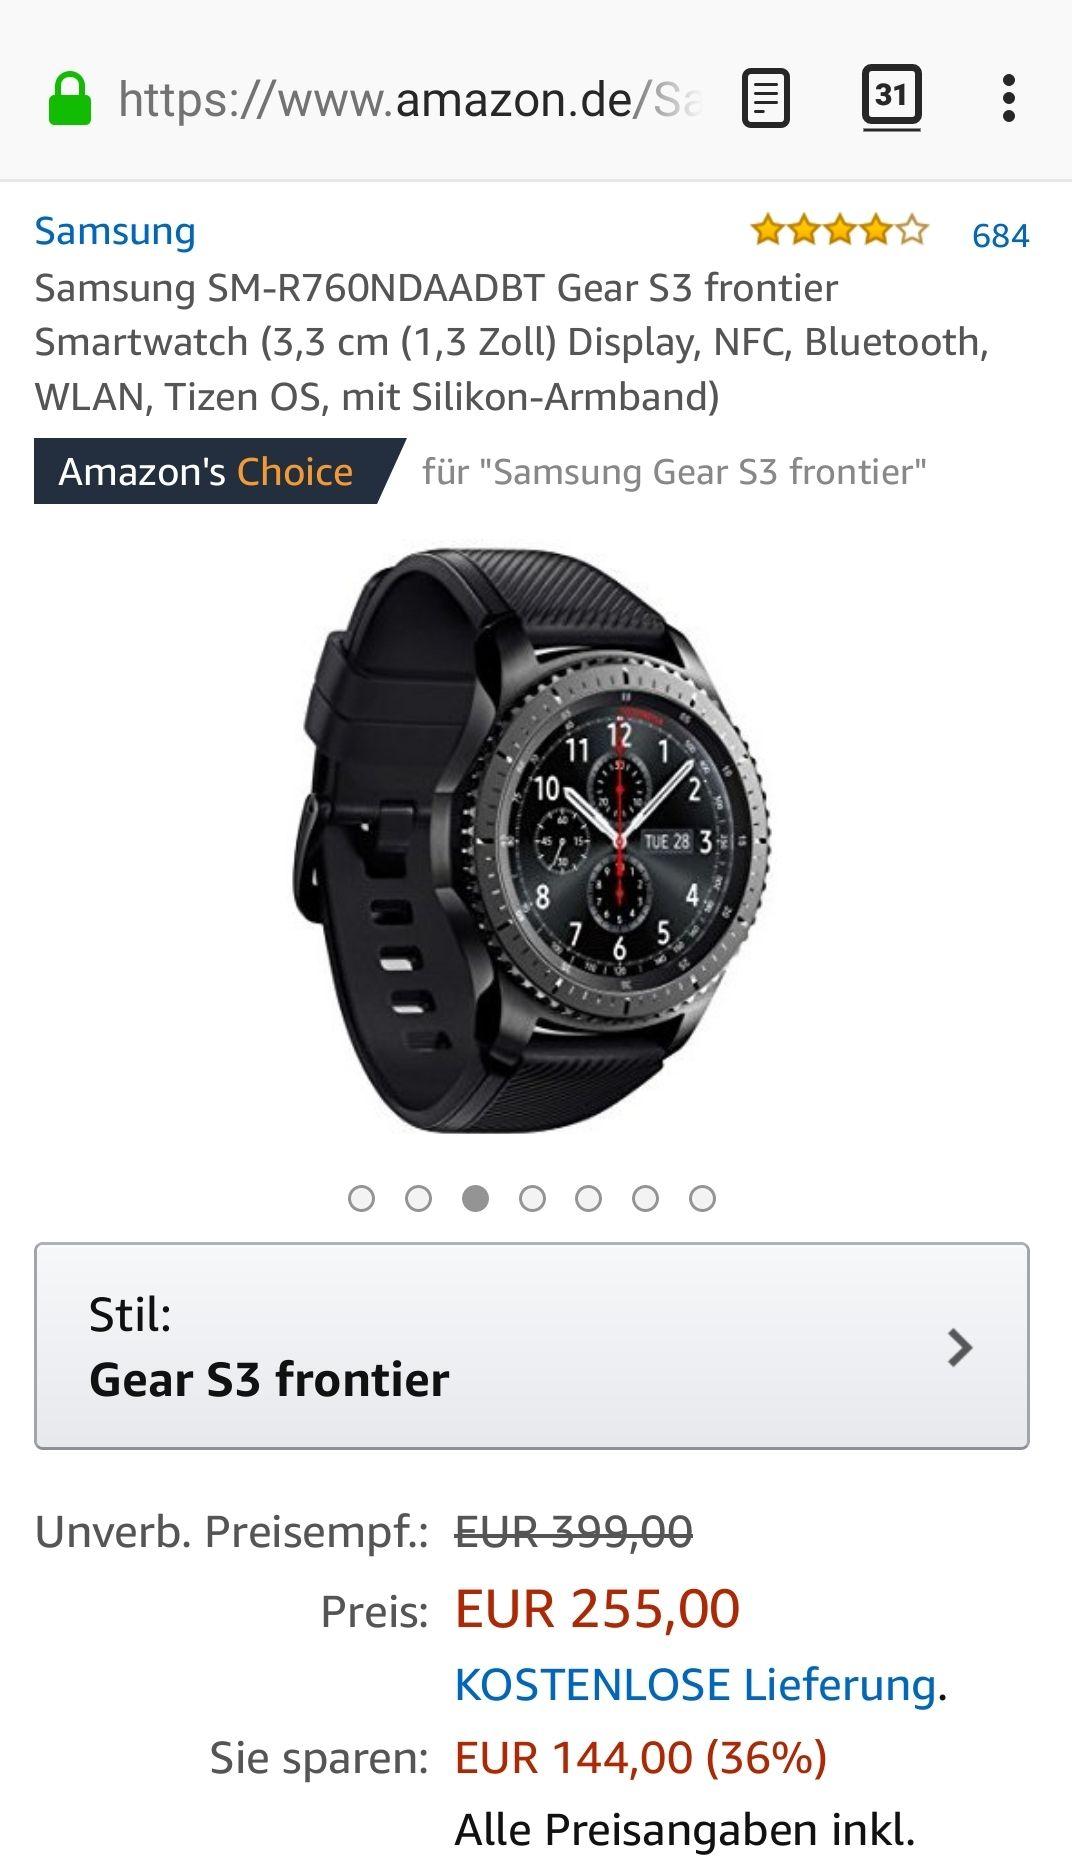 Samsung Gear S3 Frontier bei Amazon